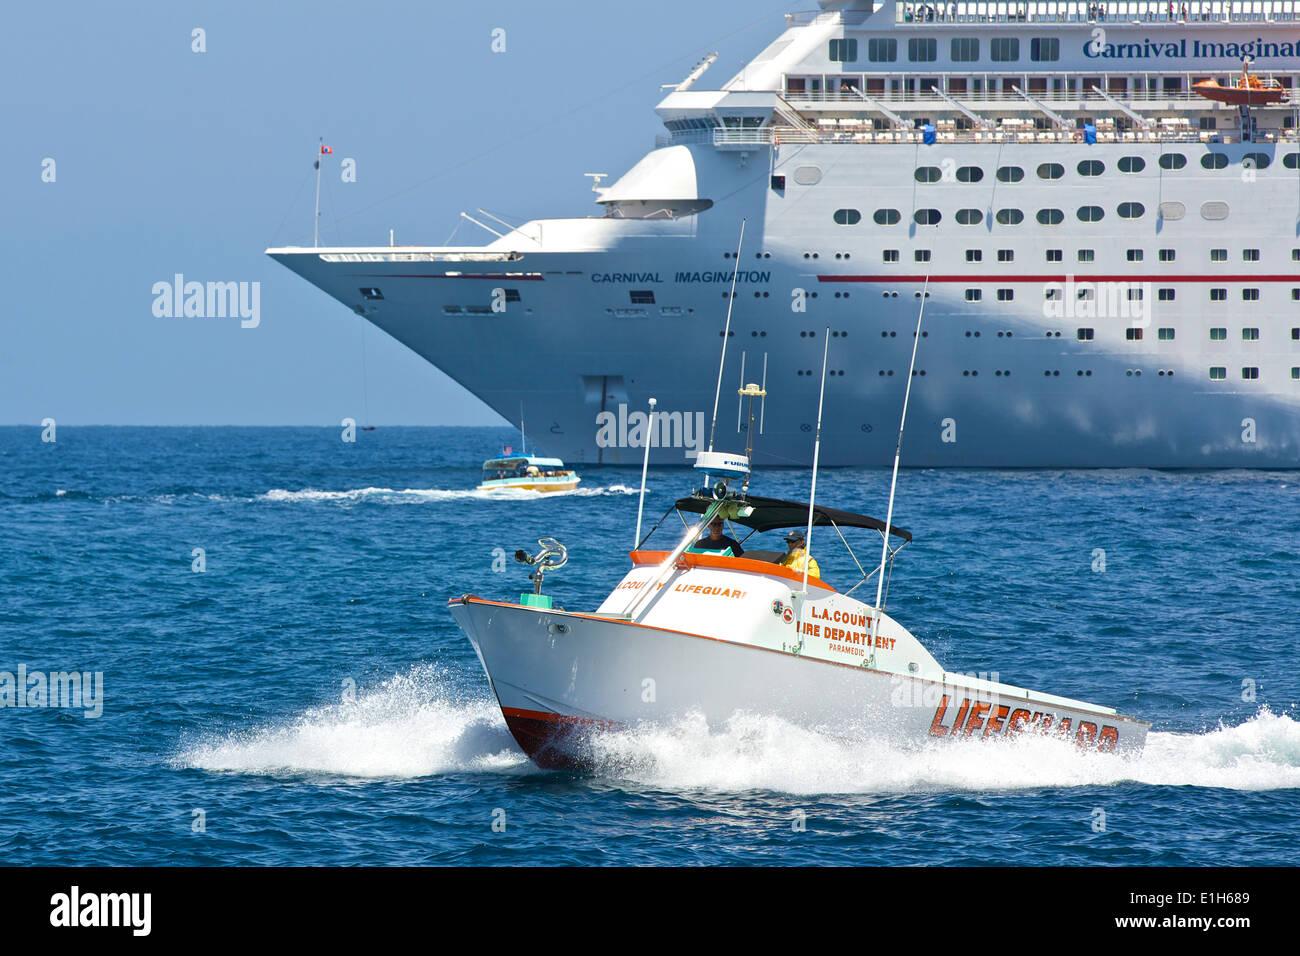 4df4de99e1aa LA County Fire Department Lifeguard Rescue Boat Speeds Past The Carnival  Inspiration Cruise Ship